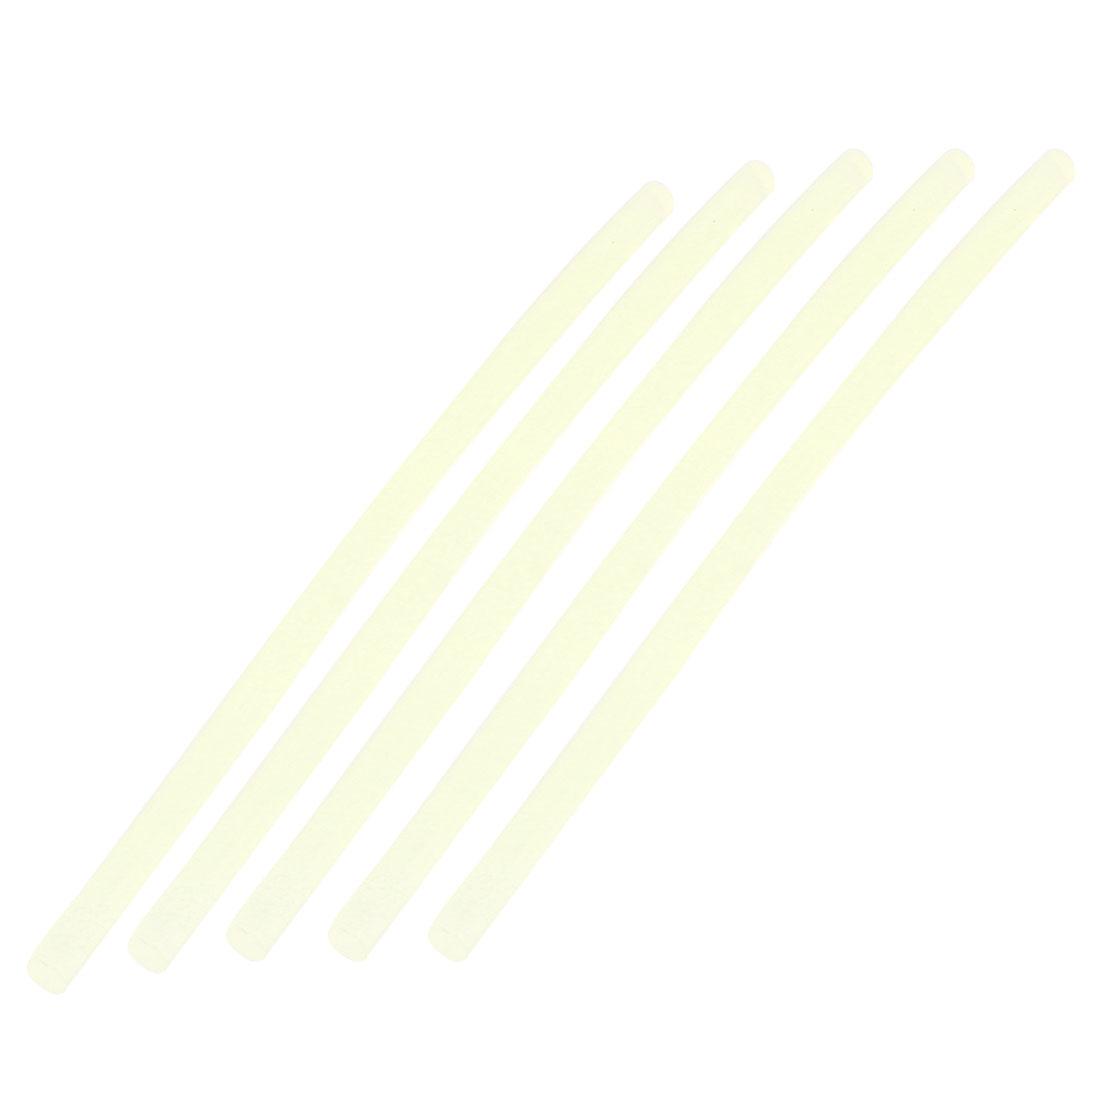 5 Pcs White Hot Melt Glue Sticks 7mm Diameter 200mm Long